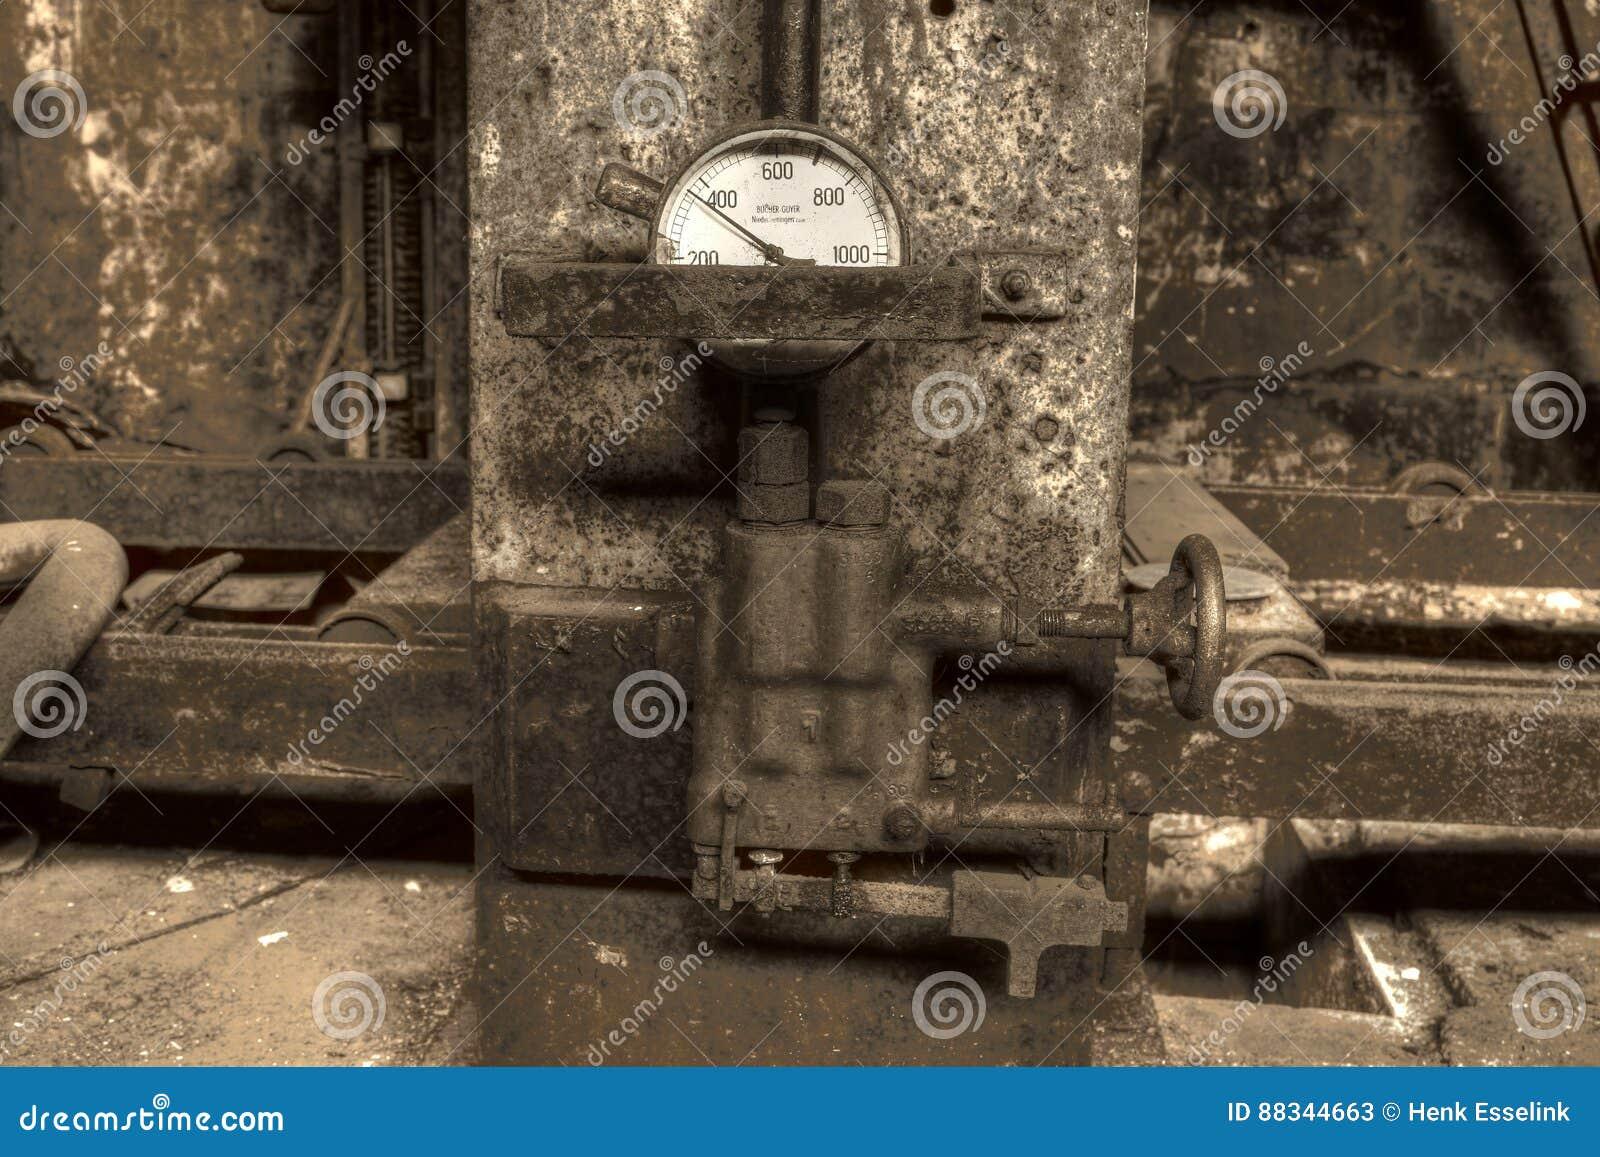 Presse hydraulique avec la mesure